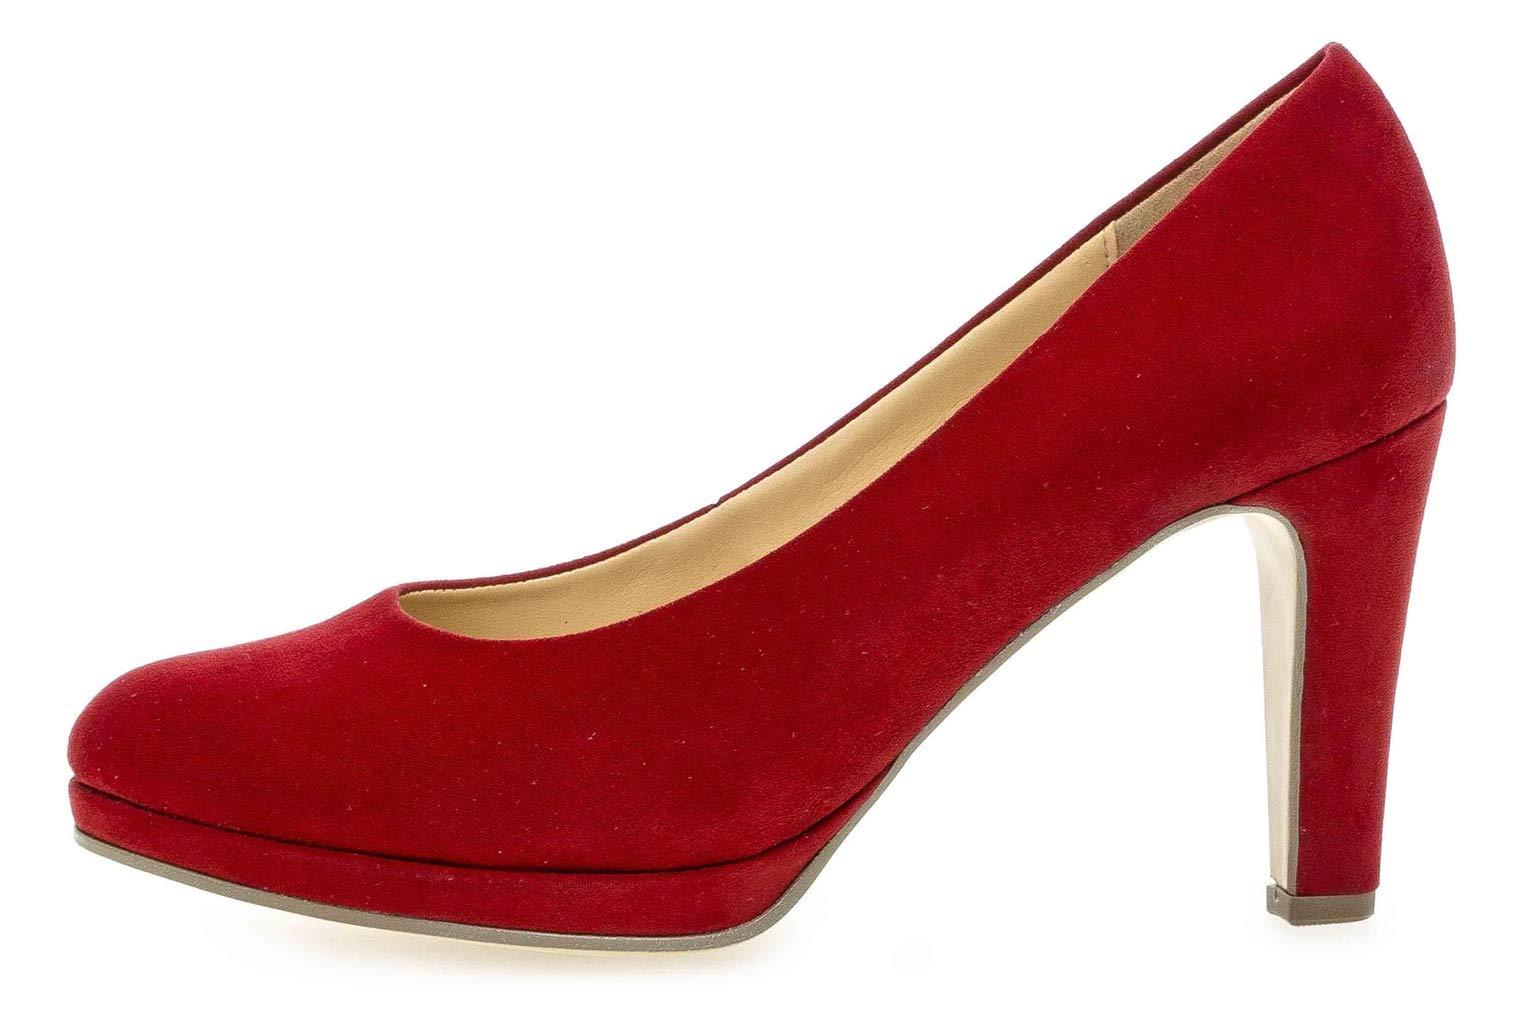 FashionEscarpins Eu FemmeRougecherry Gabor Shoes 5544 0v8wOmNn